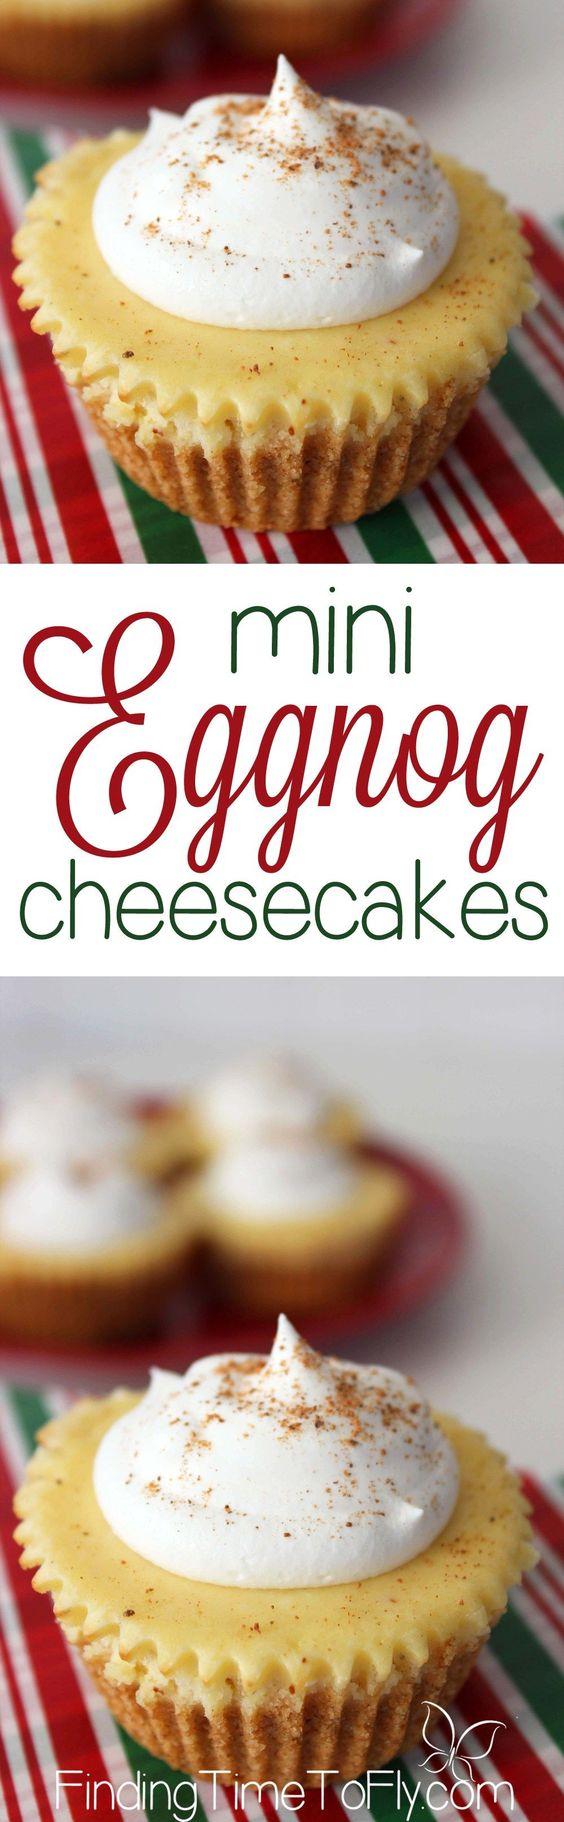 Mini Eggnog Cheesecakes Recipe Gingerbread Hot